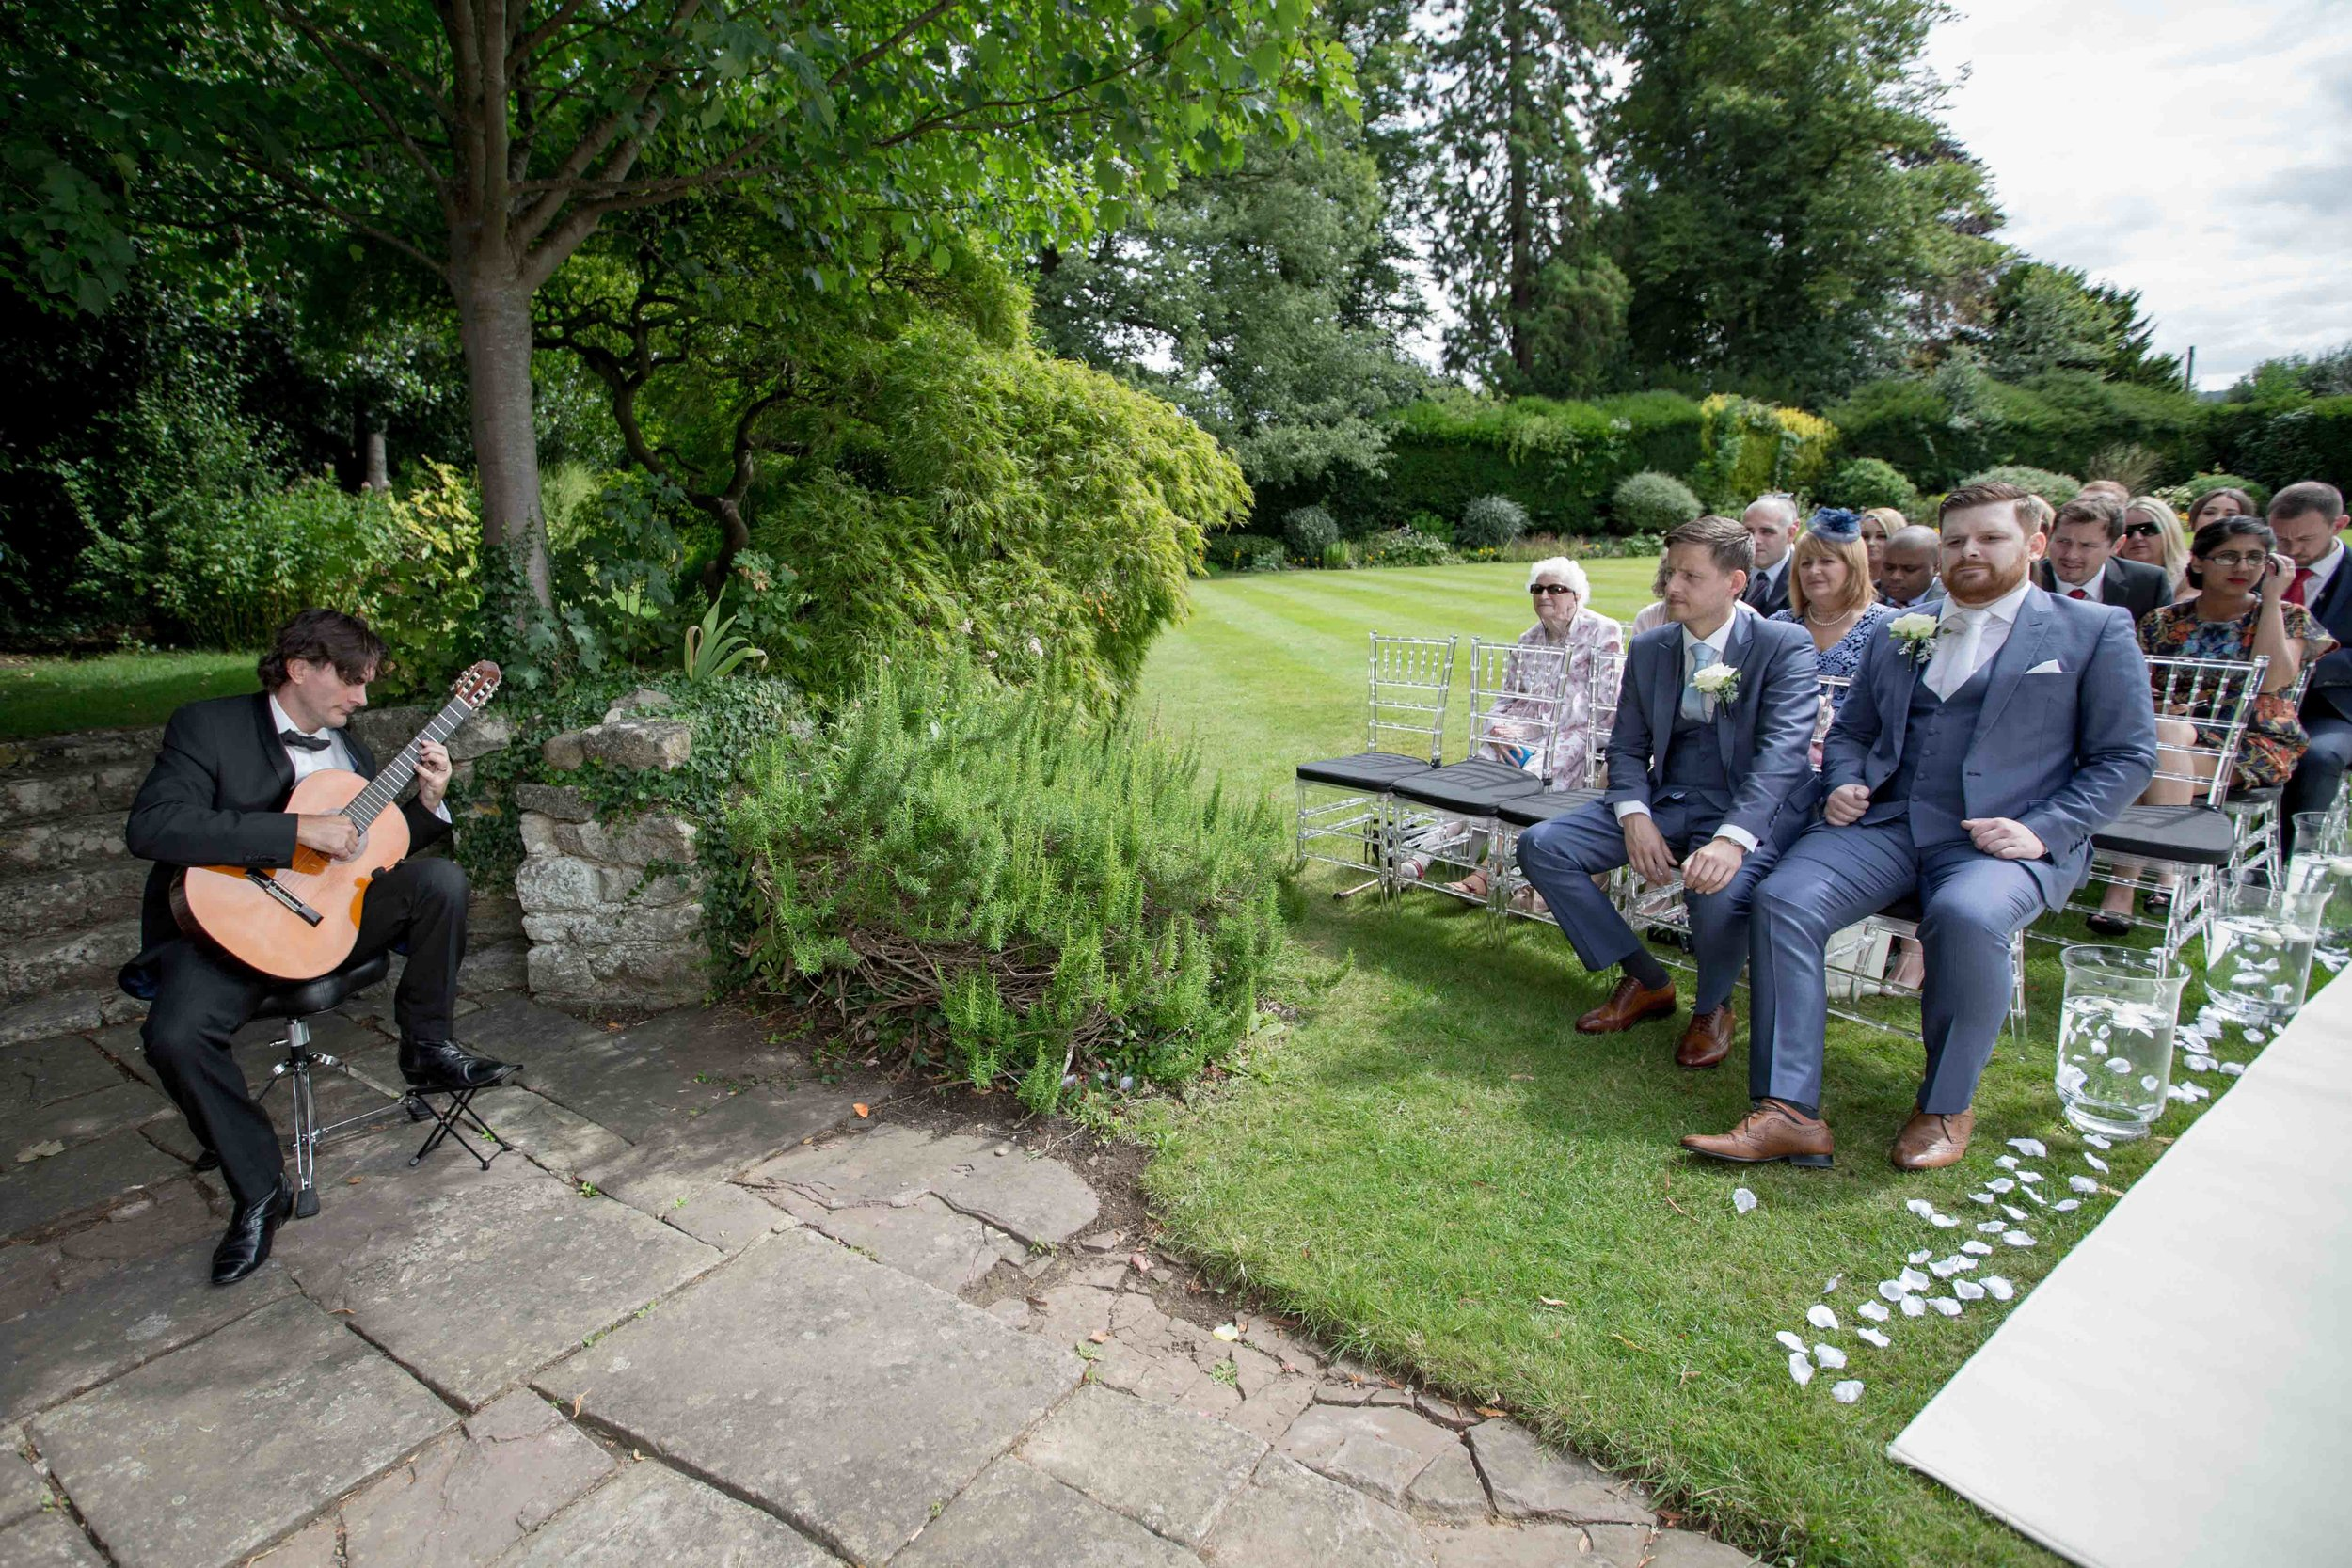 cotswold-wedding-photography-at-stonehouse-court-hotel-natalia-smith-photography-gloucestershire-wedding-photographer-27.jpg